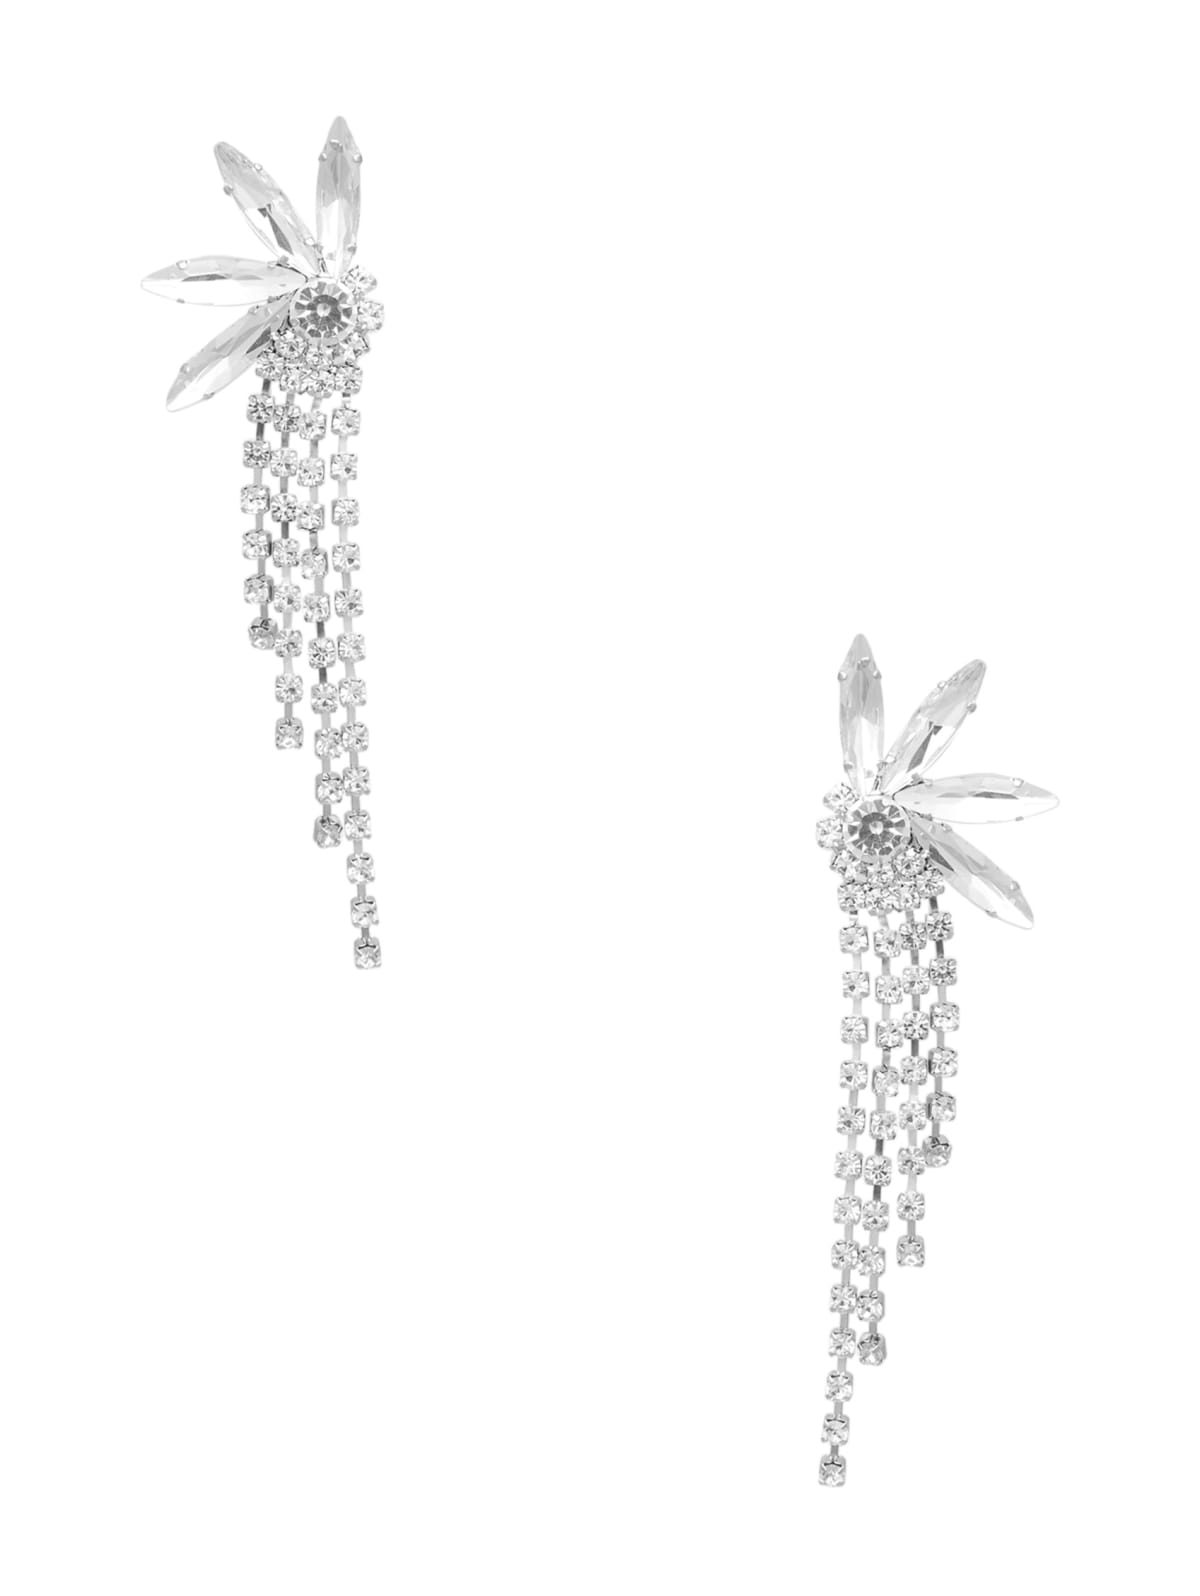 Petite Crystal Rhinestone Dangle Screw Back EarringsVintageSilver tone34 x 14 Great Condition #VBR52